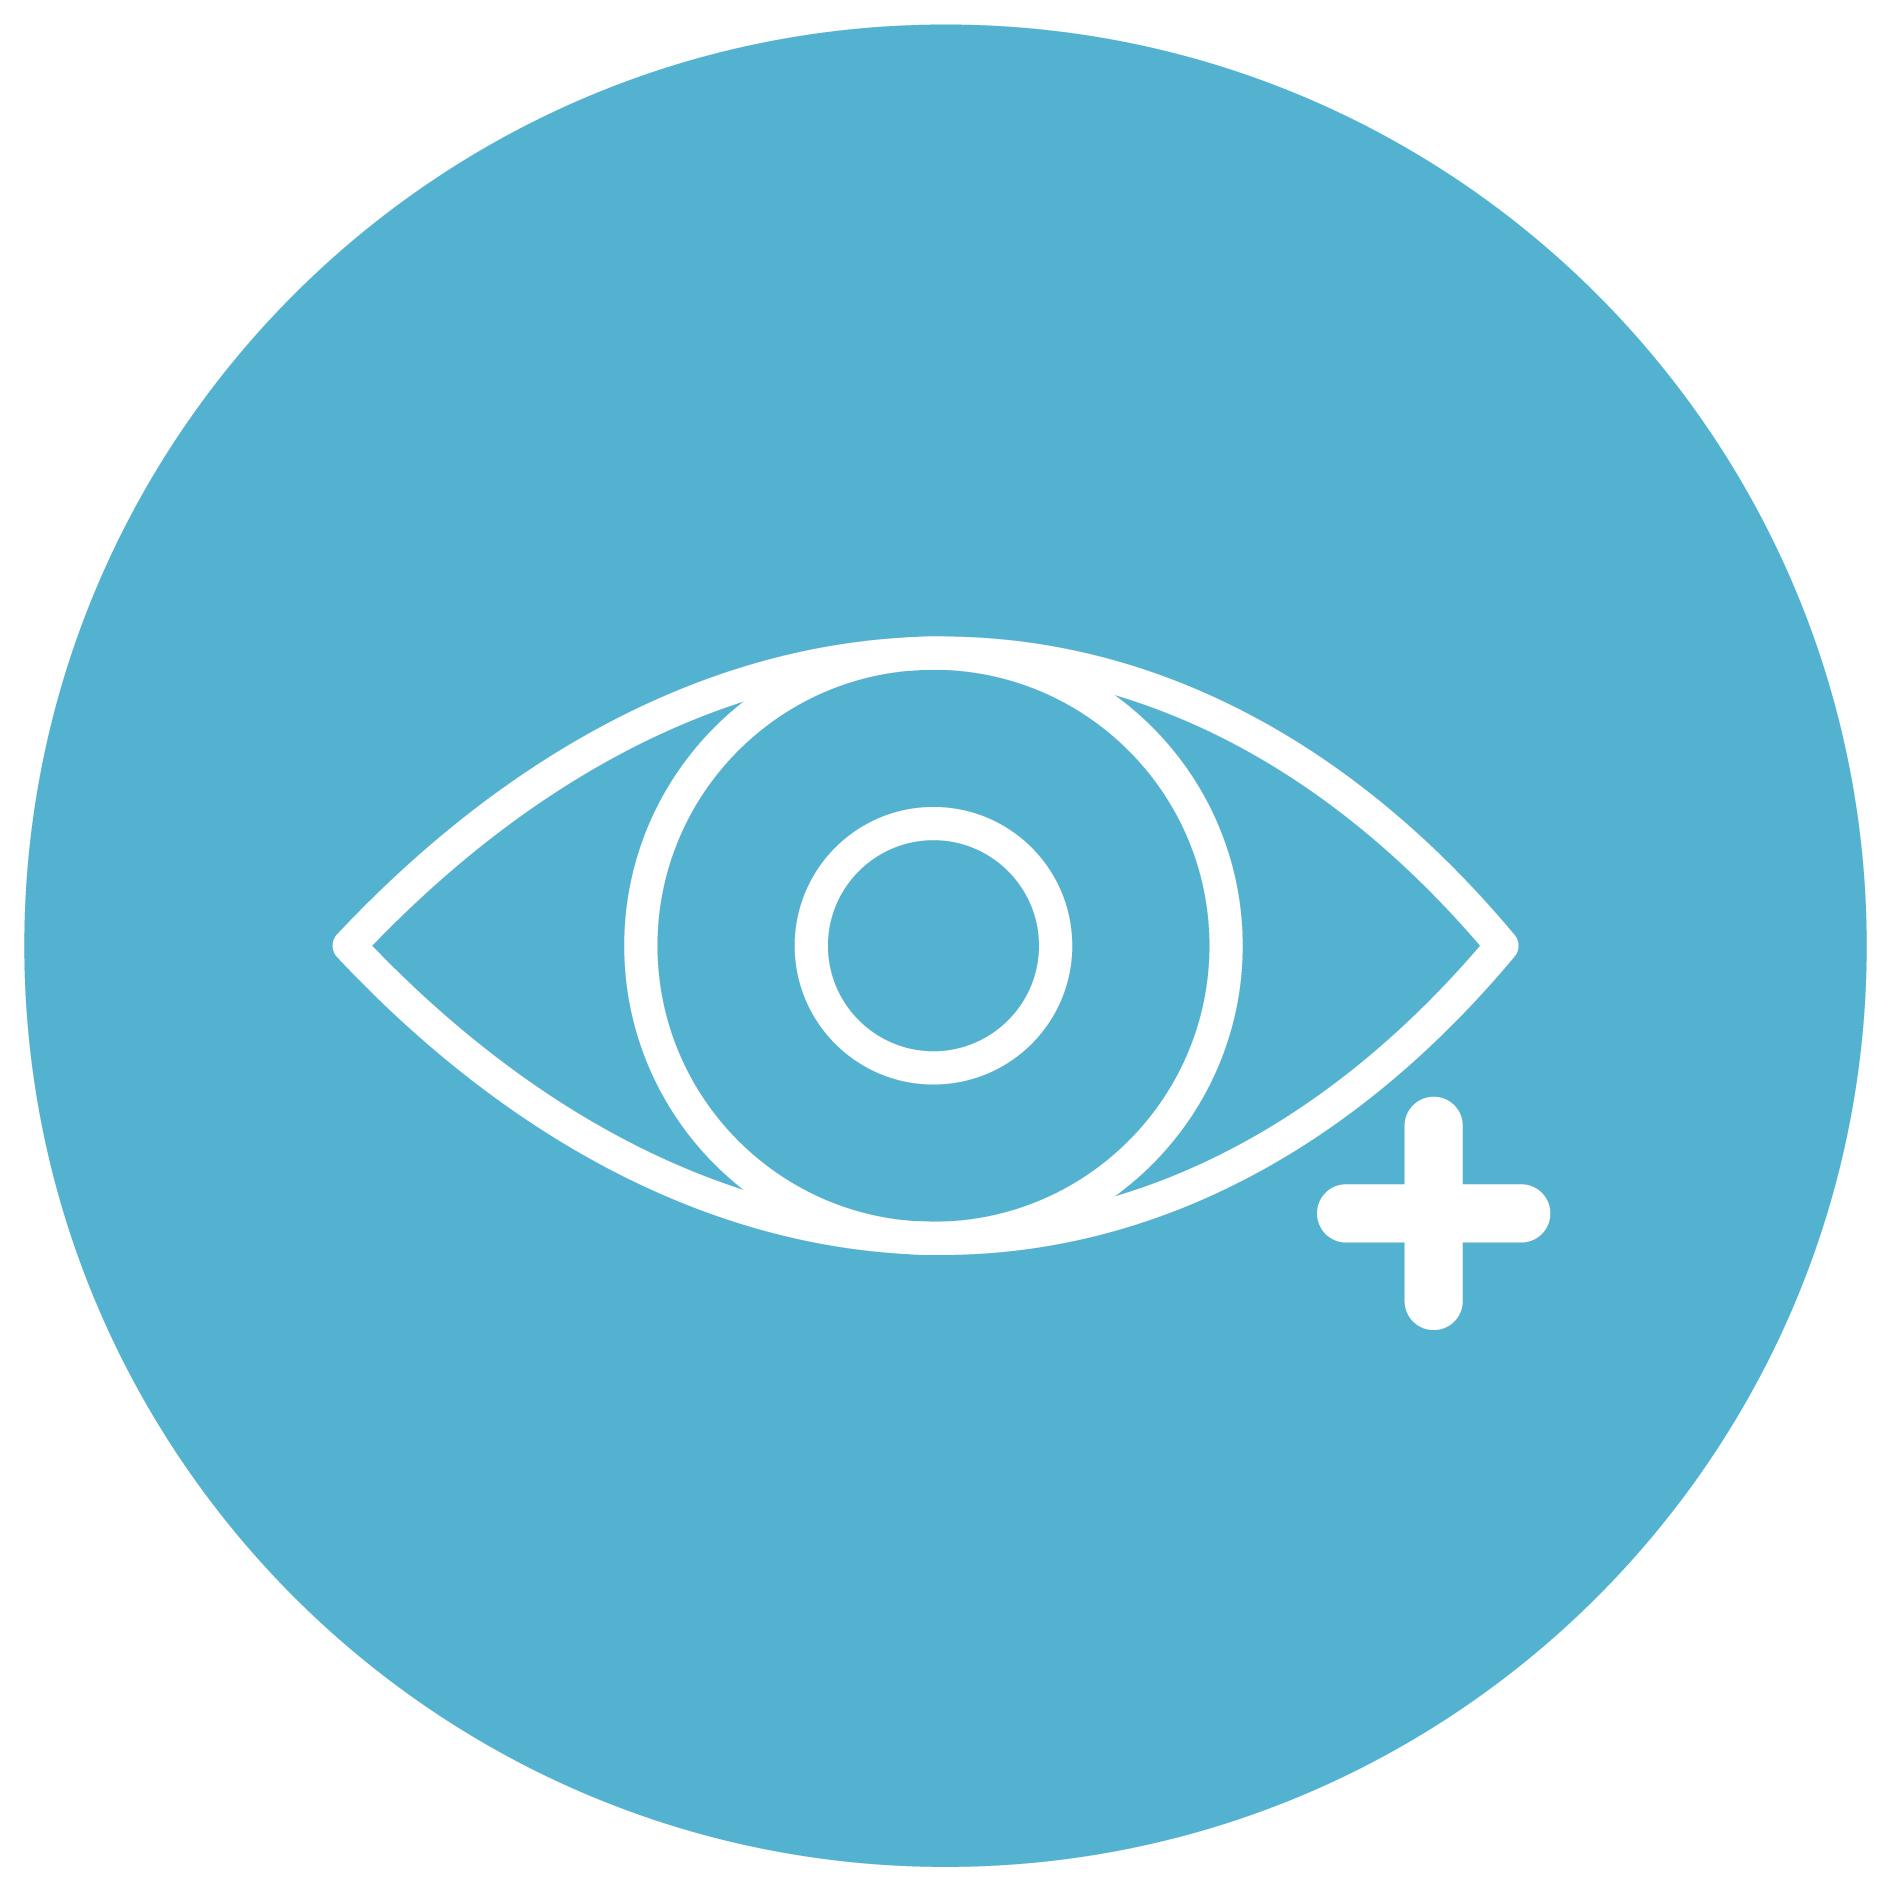 Ophthalmology EHR